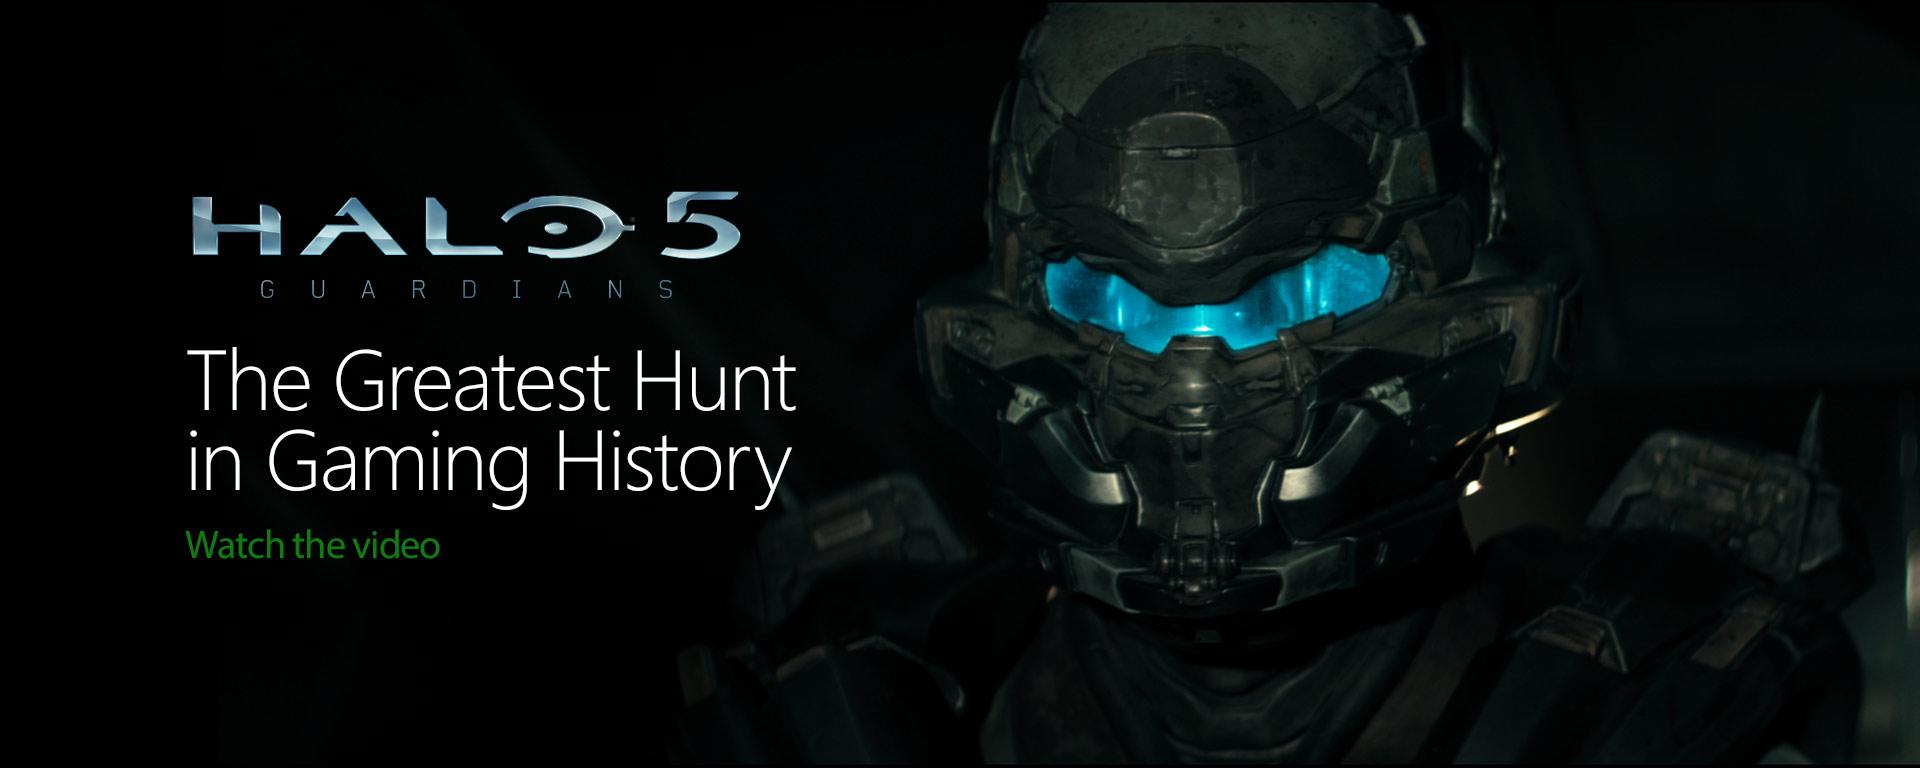 http://compass.xbox.com/assets/bc/c4/bcc4d529-87d3-4658-8483-49a722f3ed43.jpg?n=Halo-5-Hunt-Begins_superhero-desktop_1920x768_02.jpg